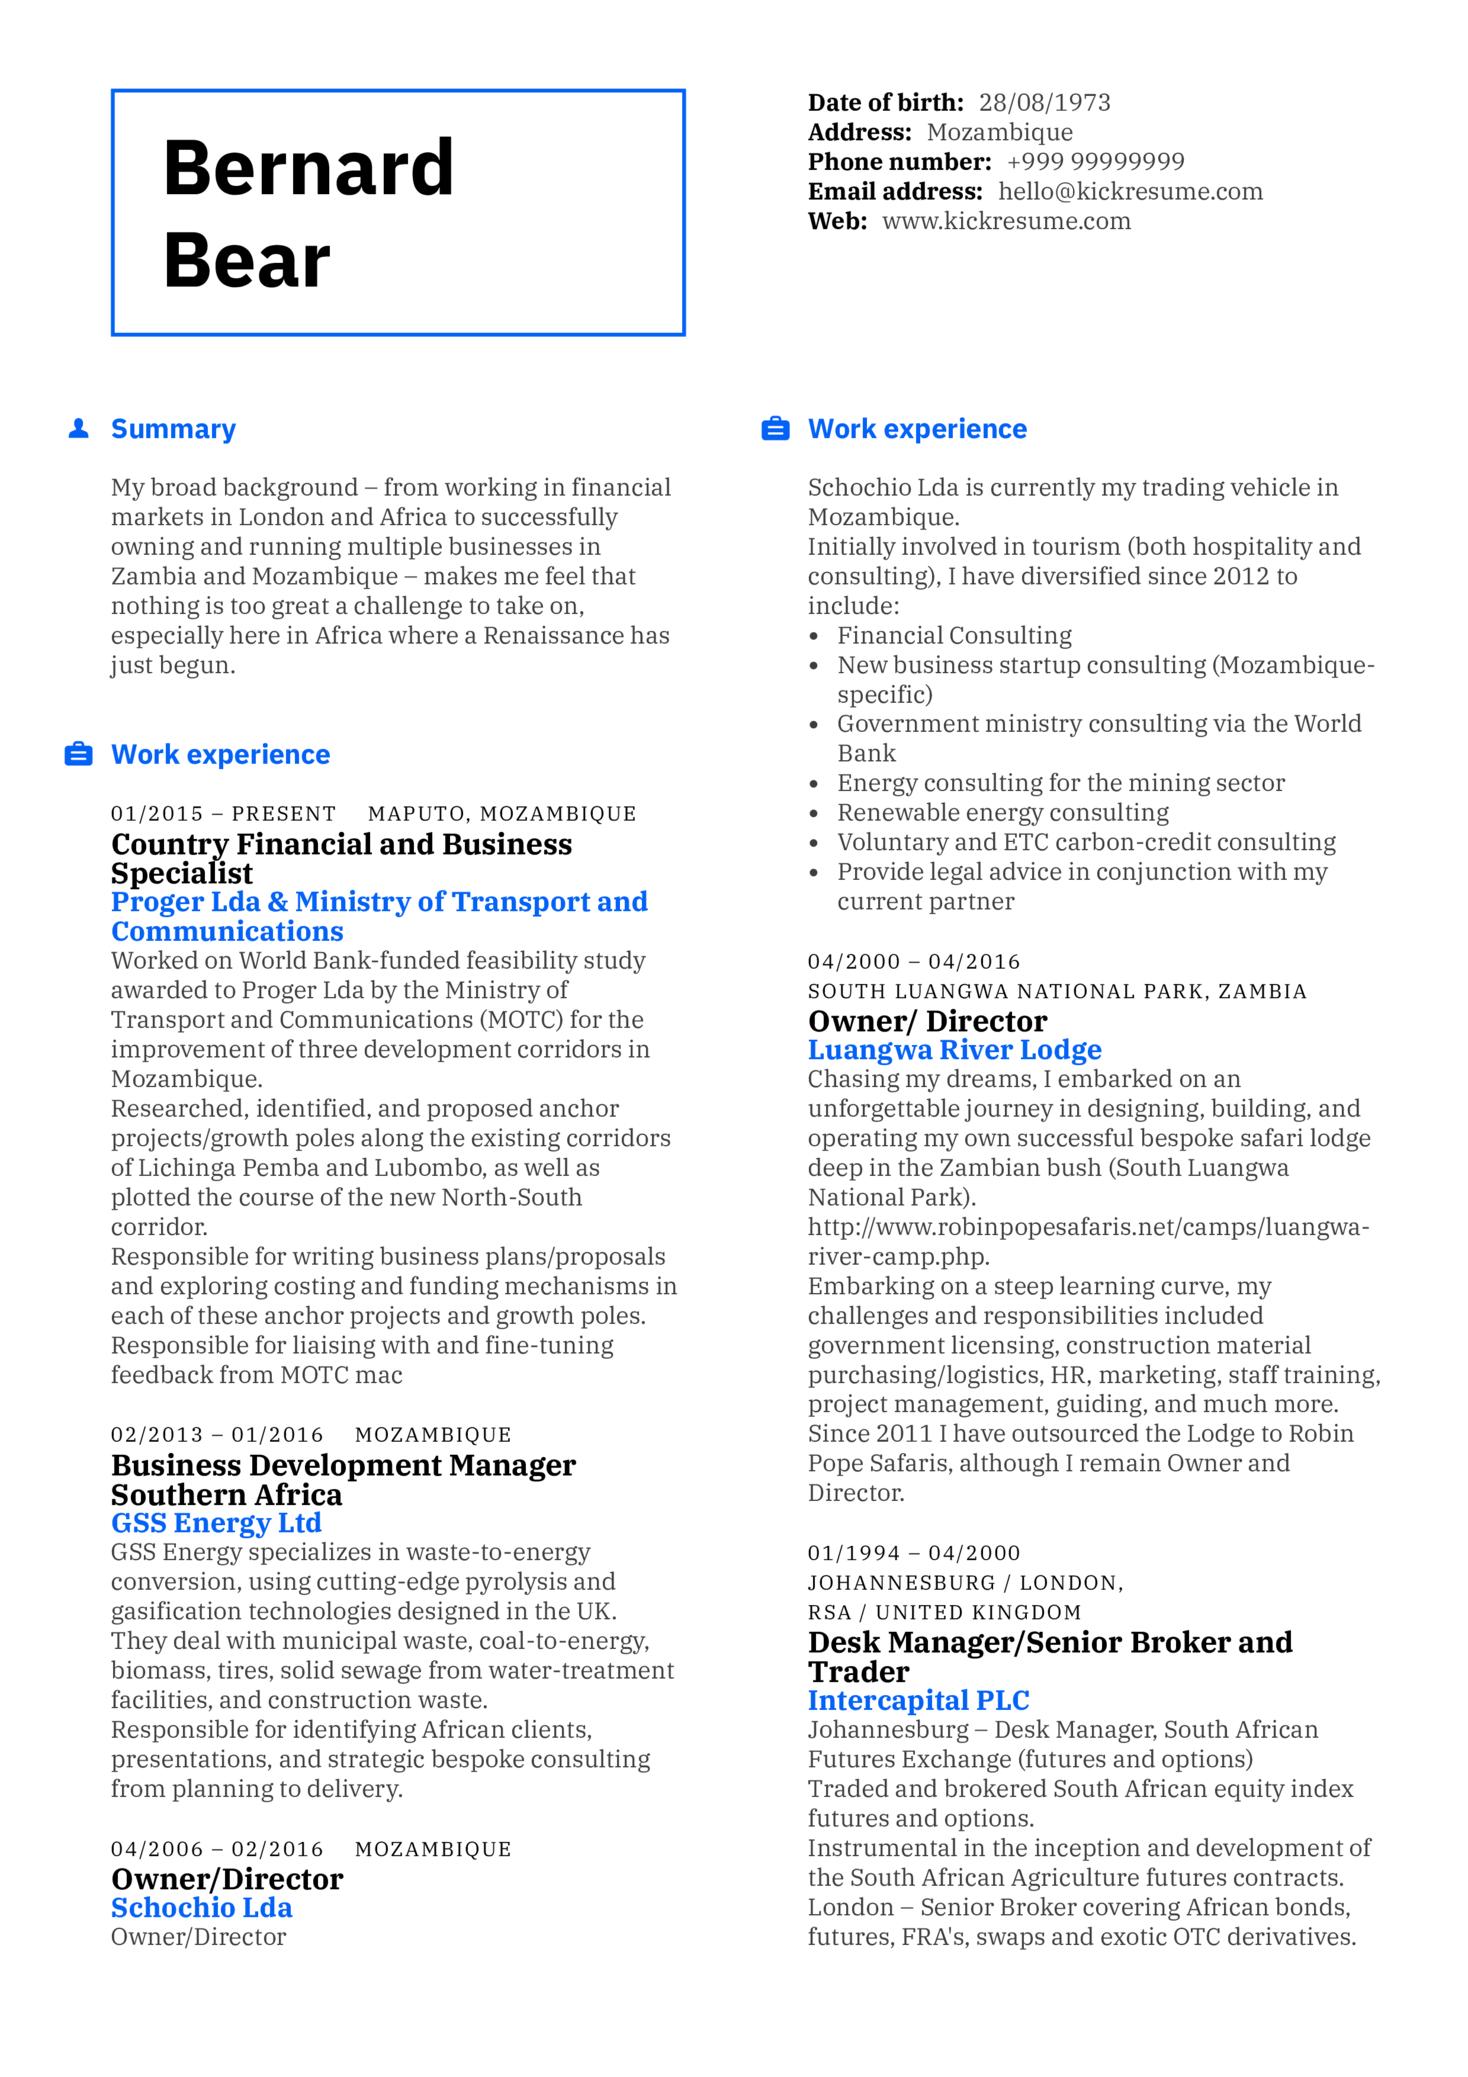 Business Specialist Resume Sample (parte 1)